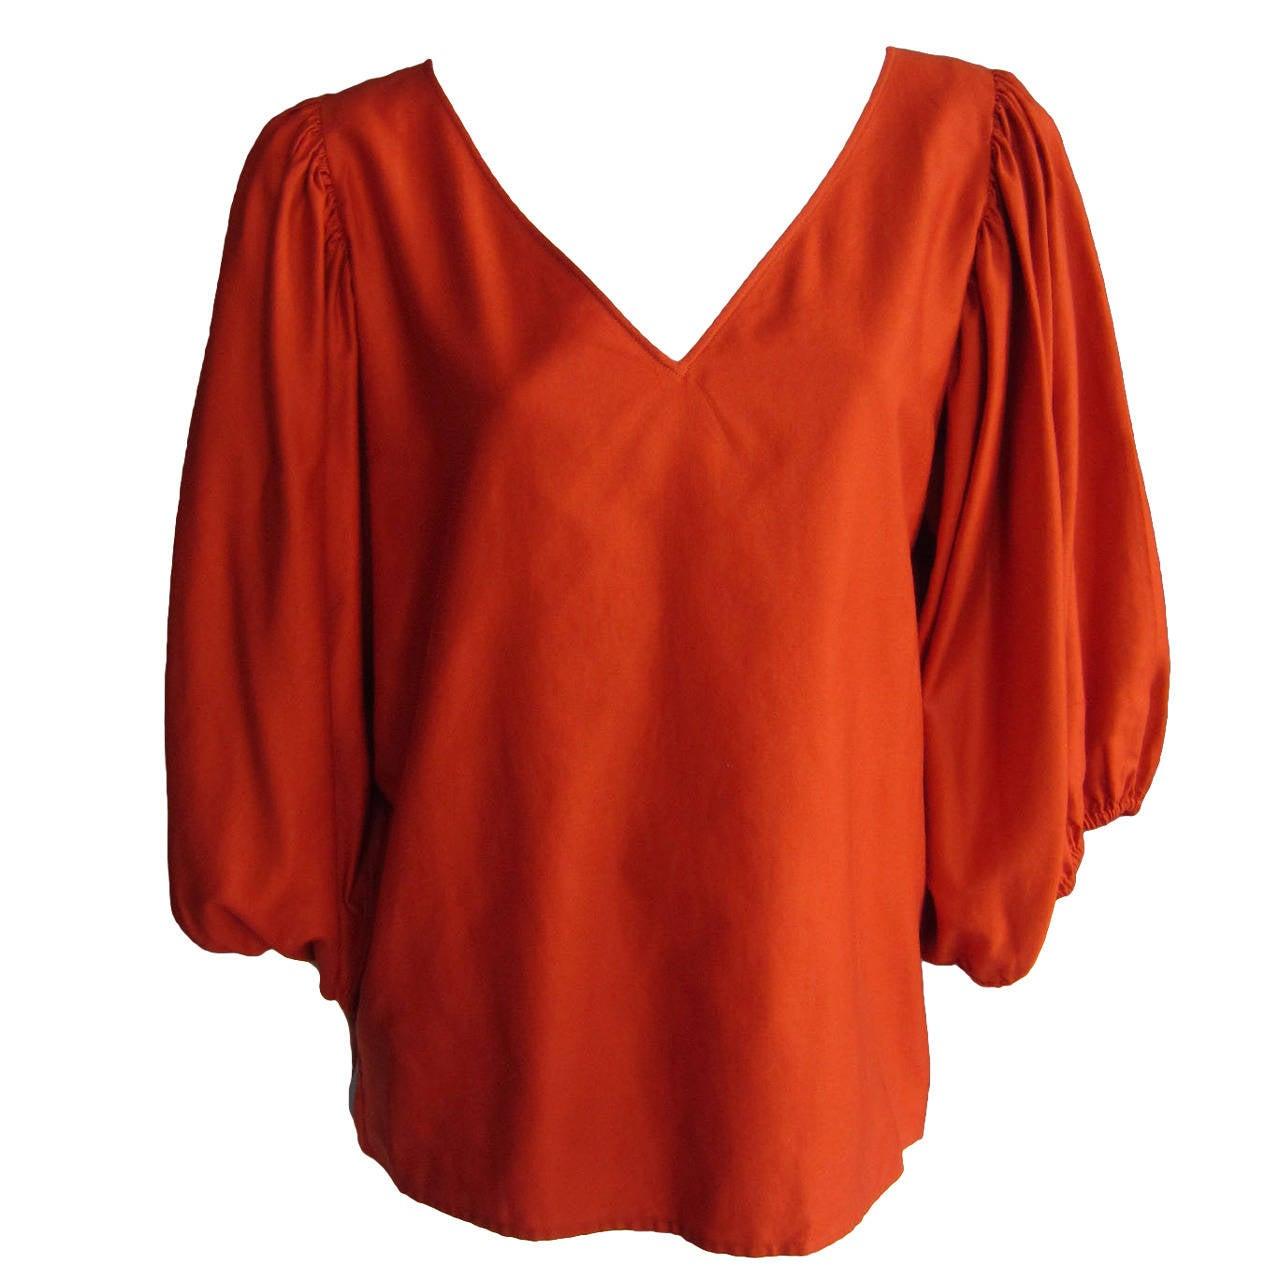 Womens See Through Shirts